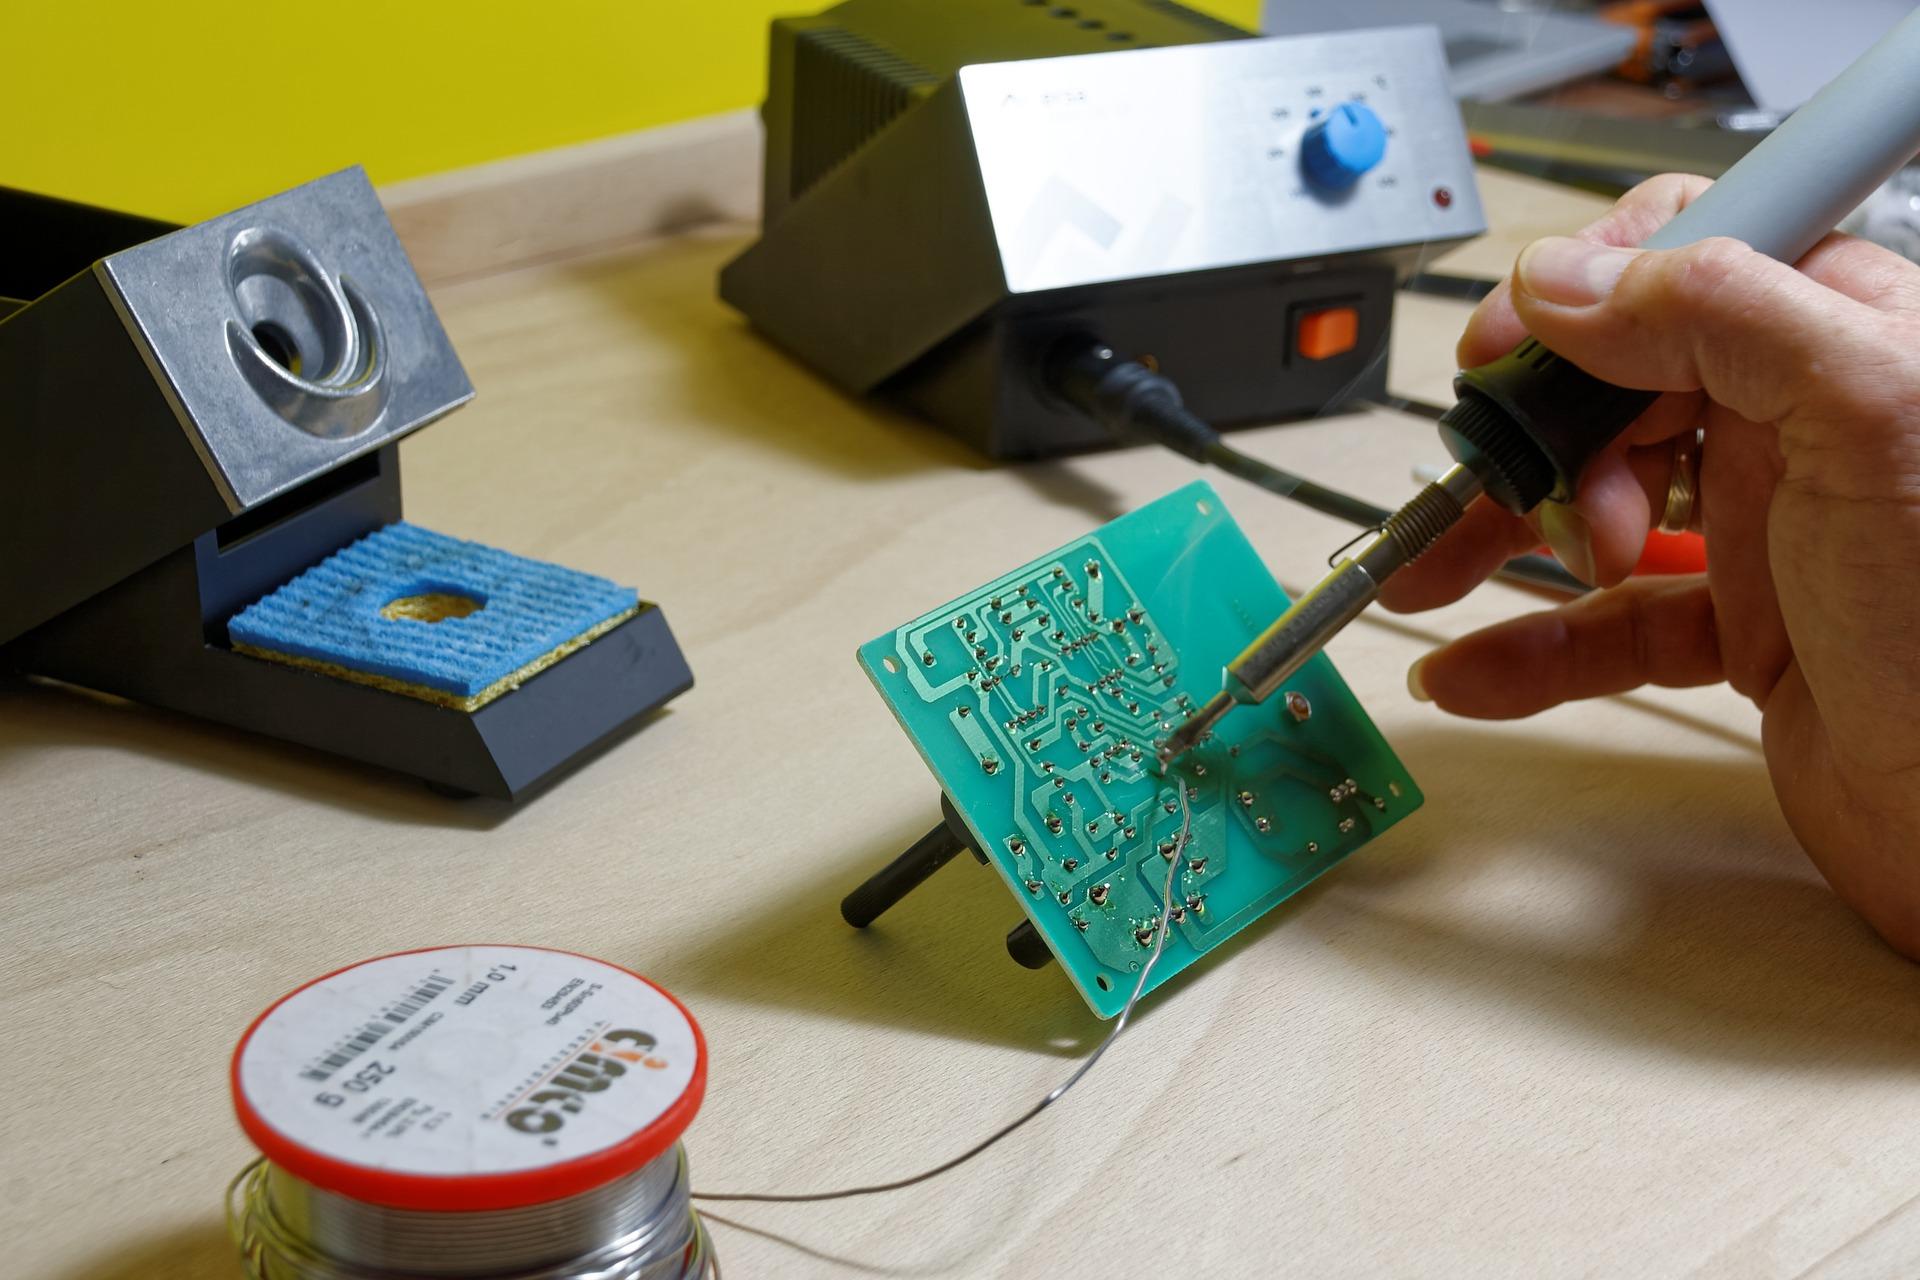 - Electrical engineer